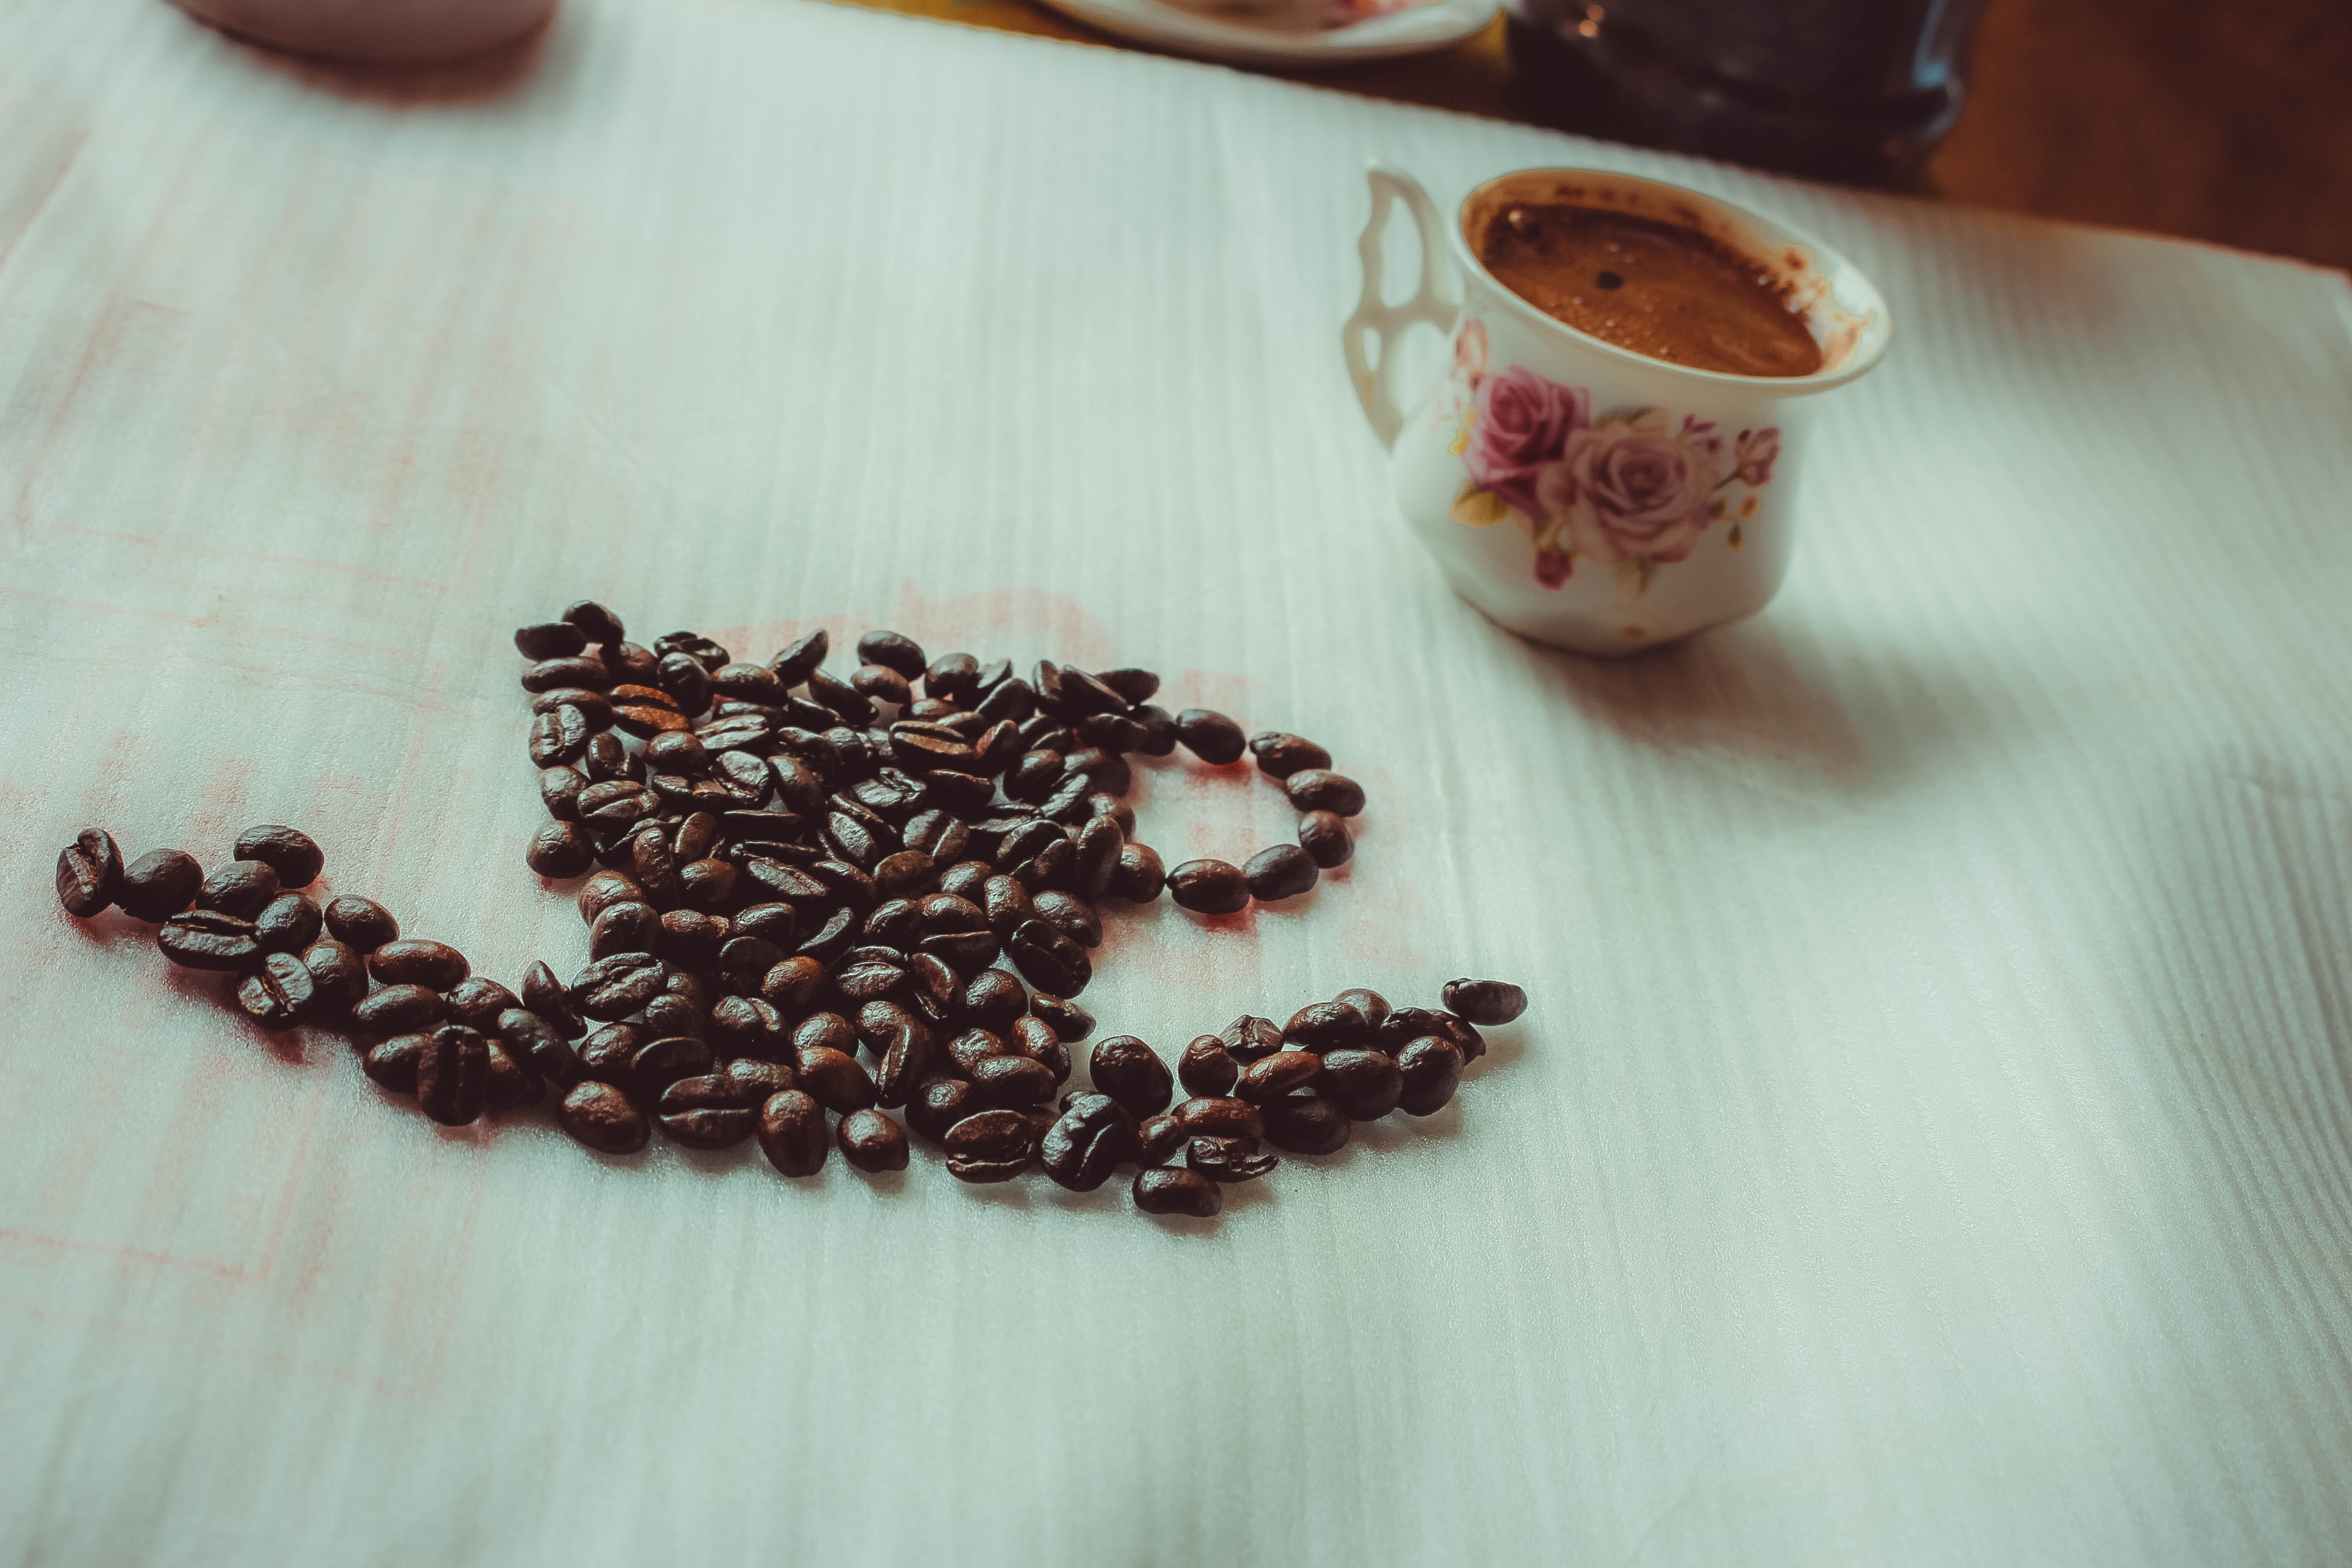 Brown Coffee Beans Beside Ceramic Mug on Table